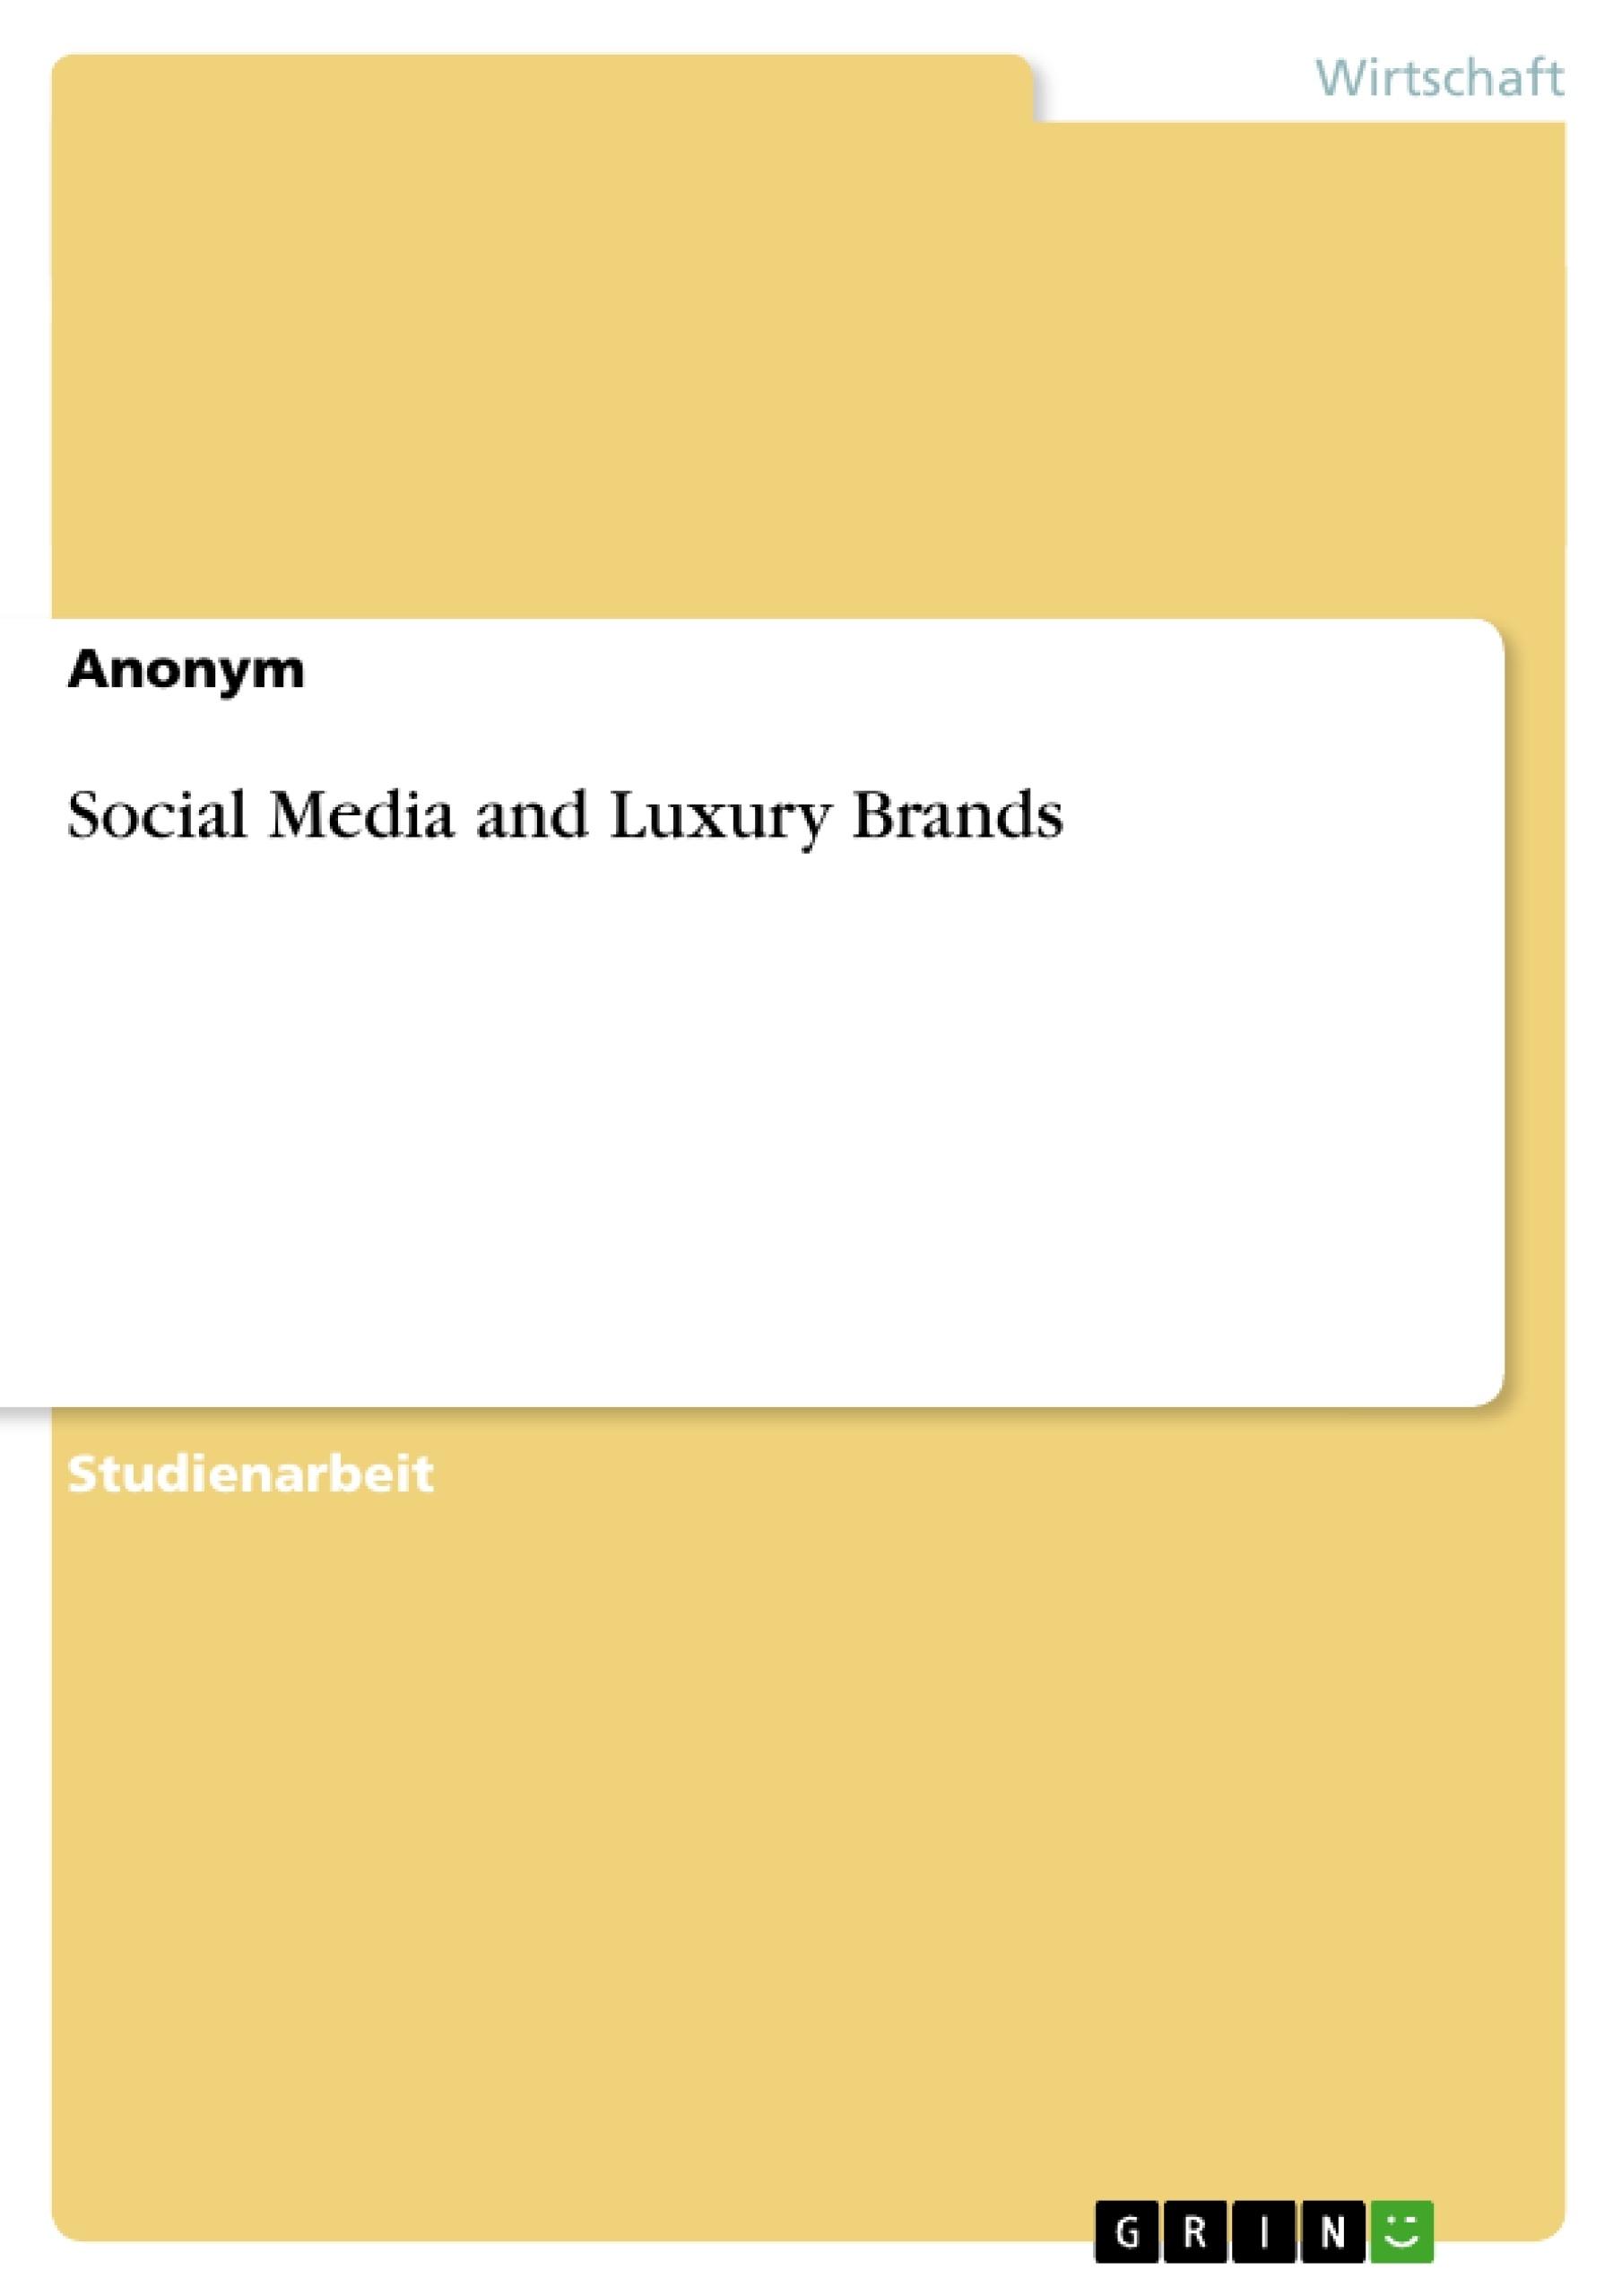 Titel: Social Media and Luxury Brands